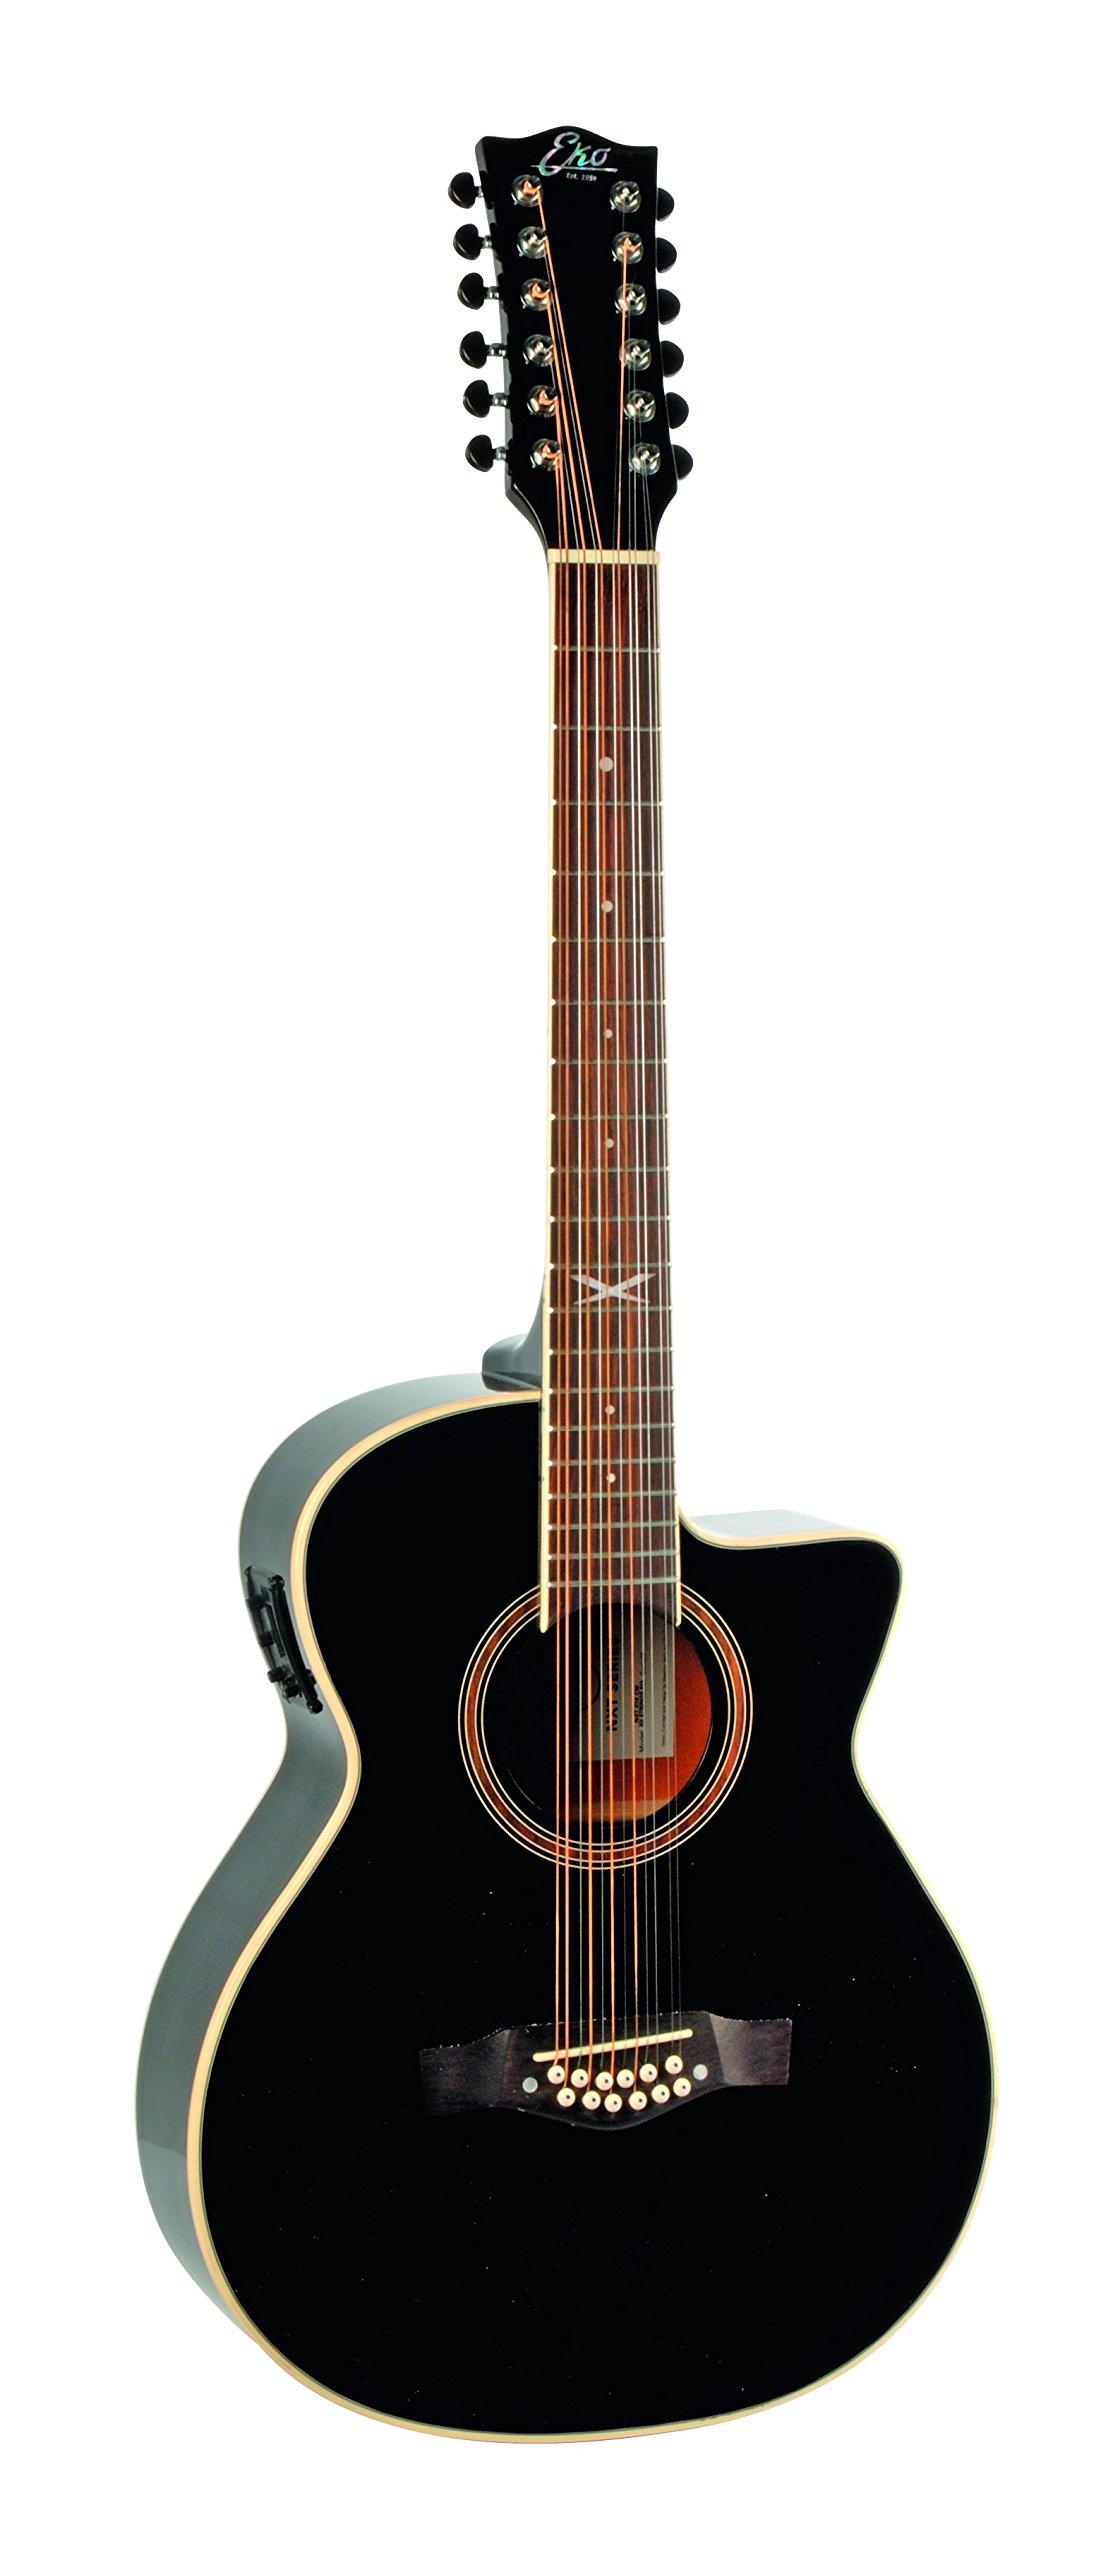 EKO Guitars 06217029 NXT Series 12-String Auditorium Cutaway Acoustic-Electric Guitar, Black